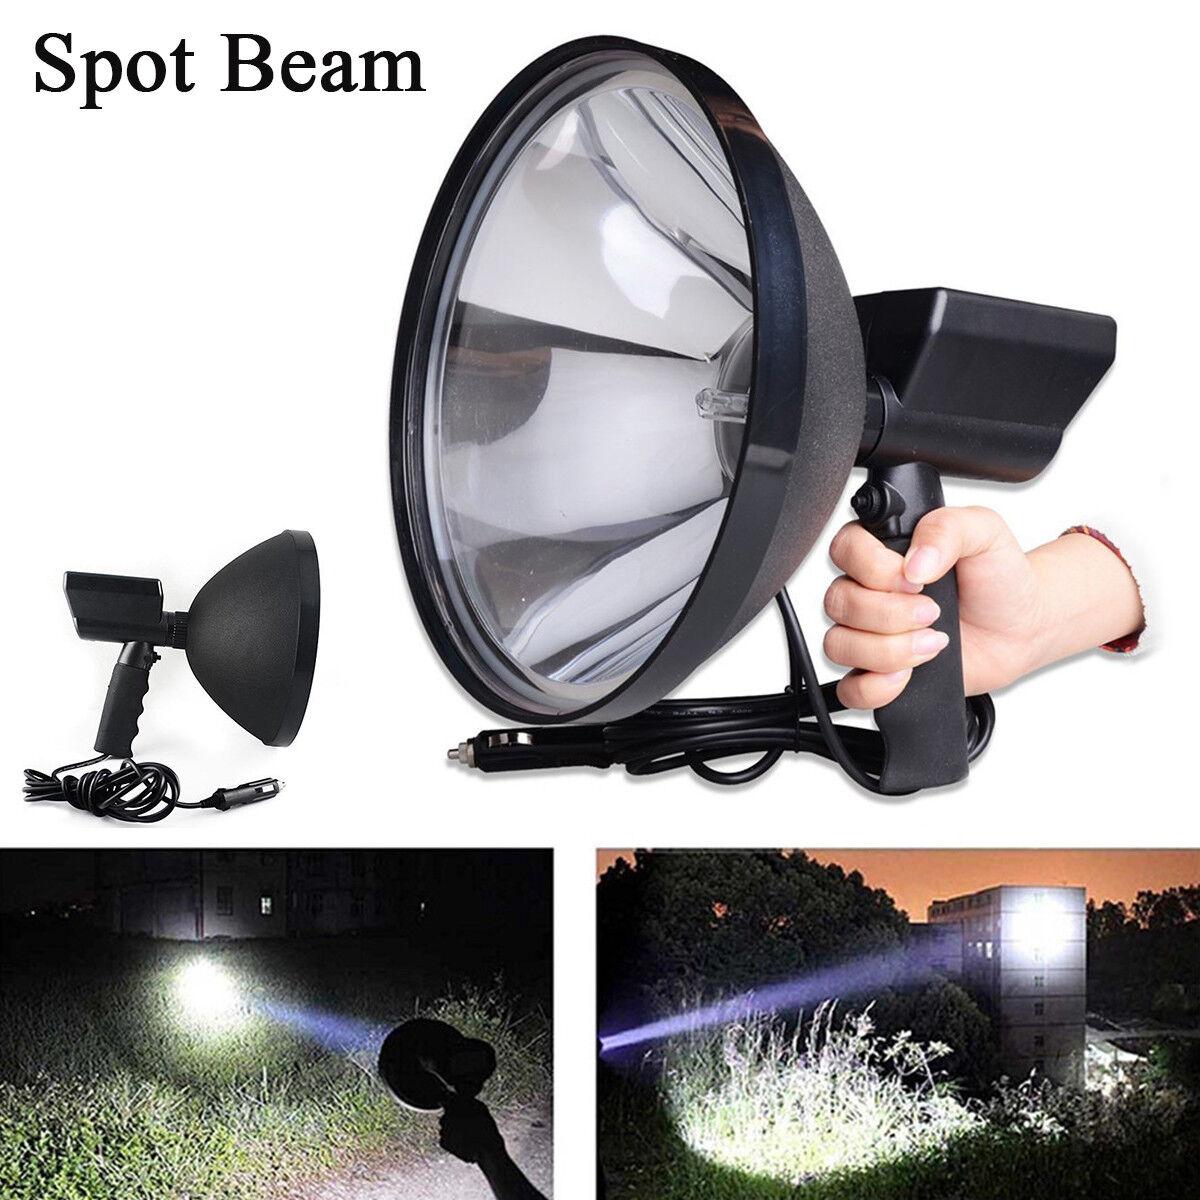 HID 6000K White Spot Beam Portable Handheld Camping Hunting Fishing Xenon Light